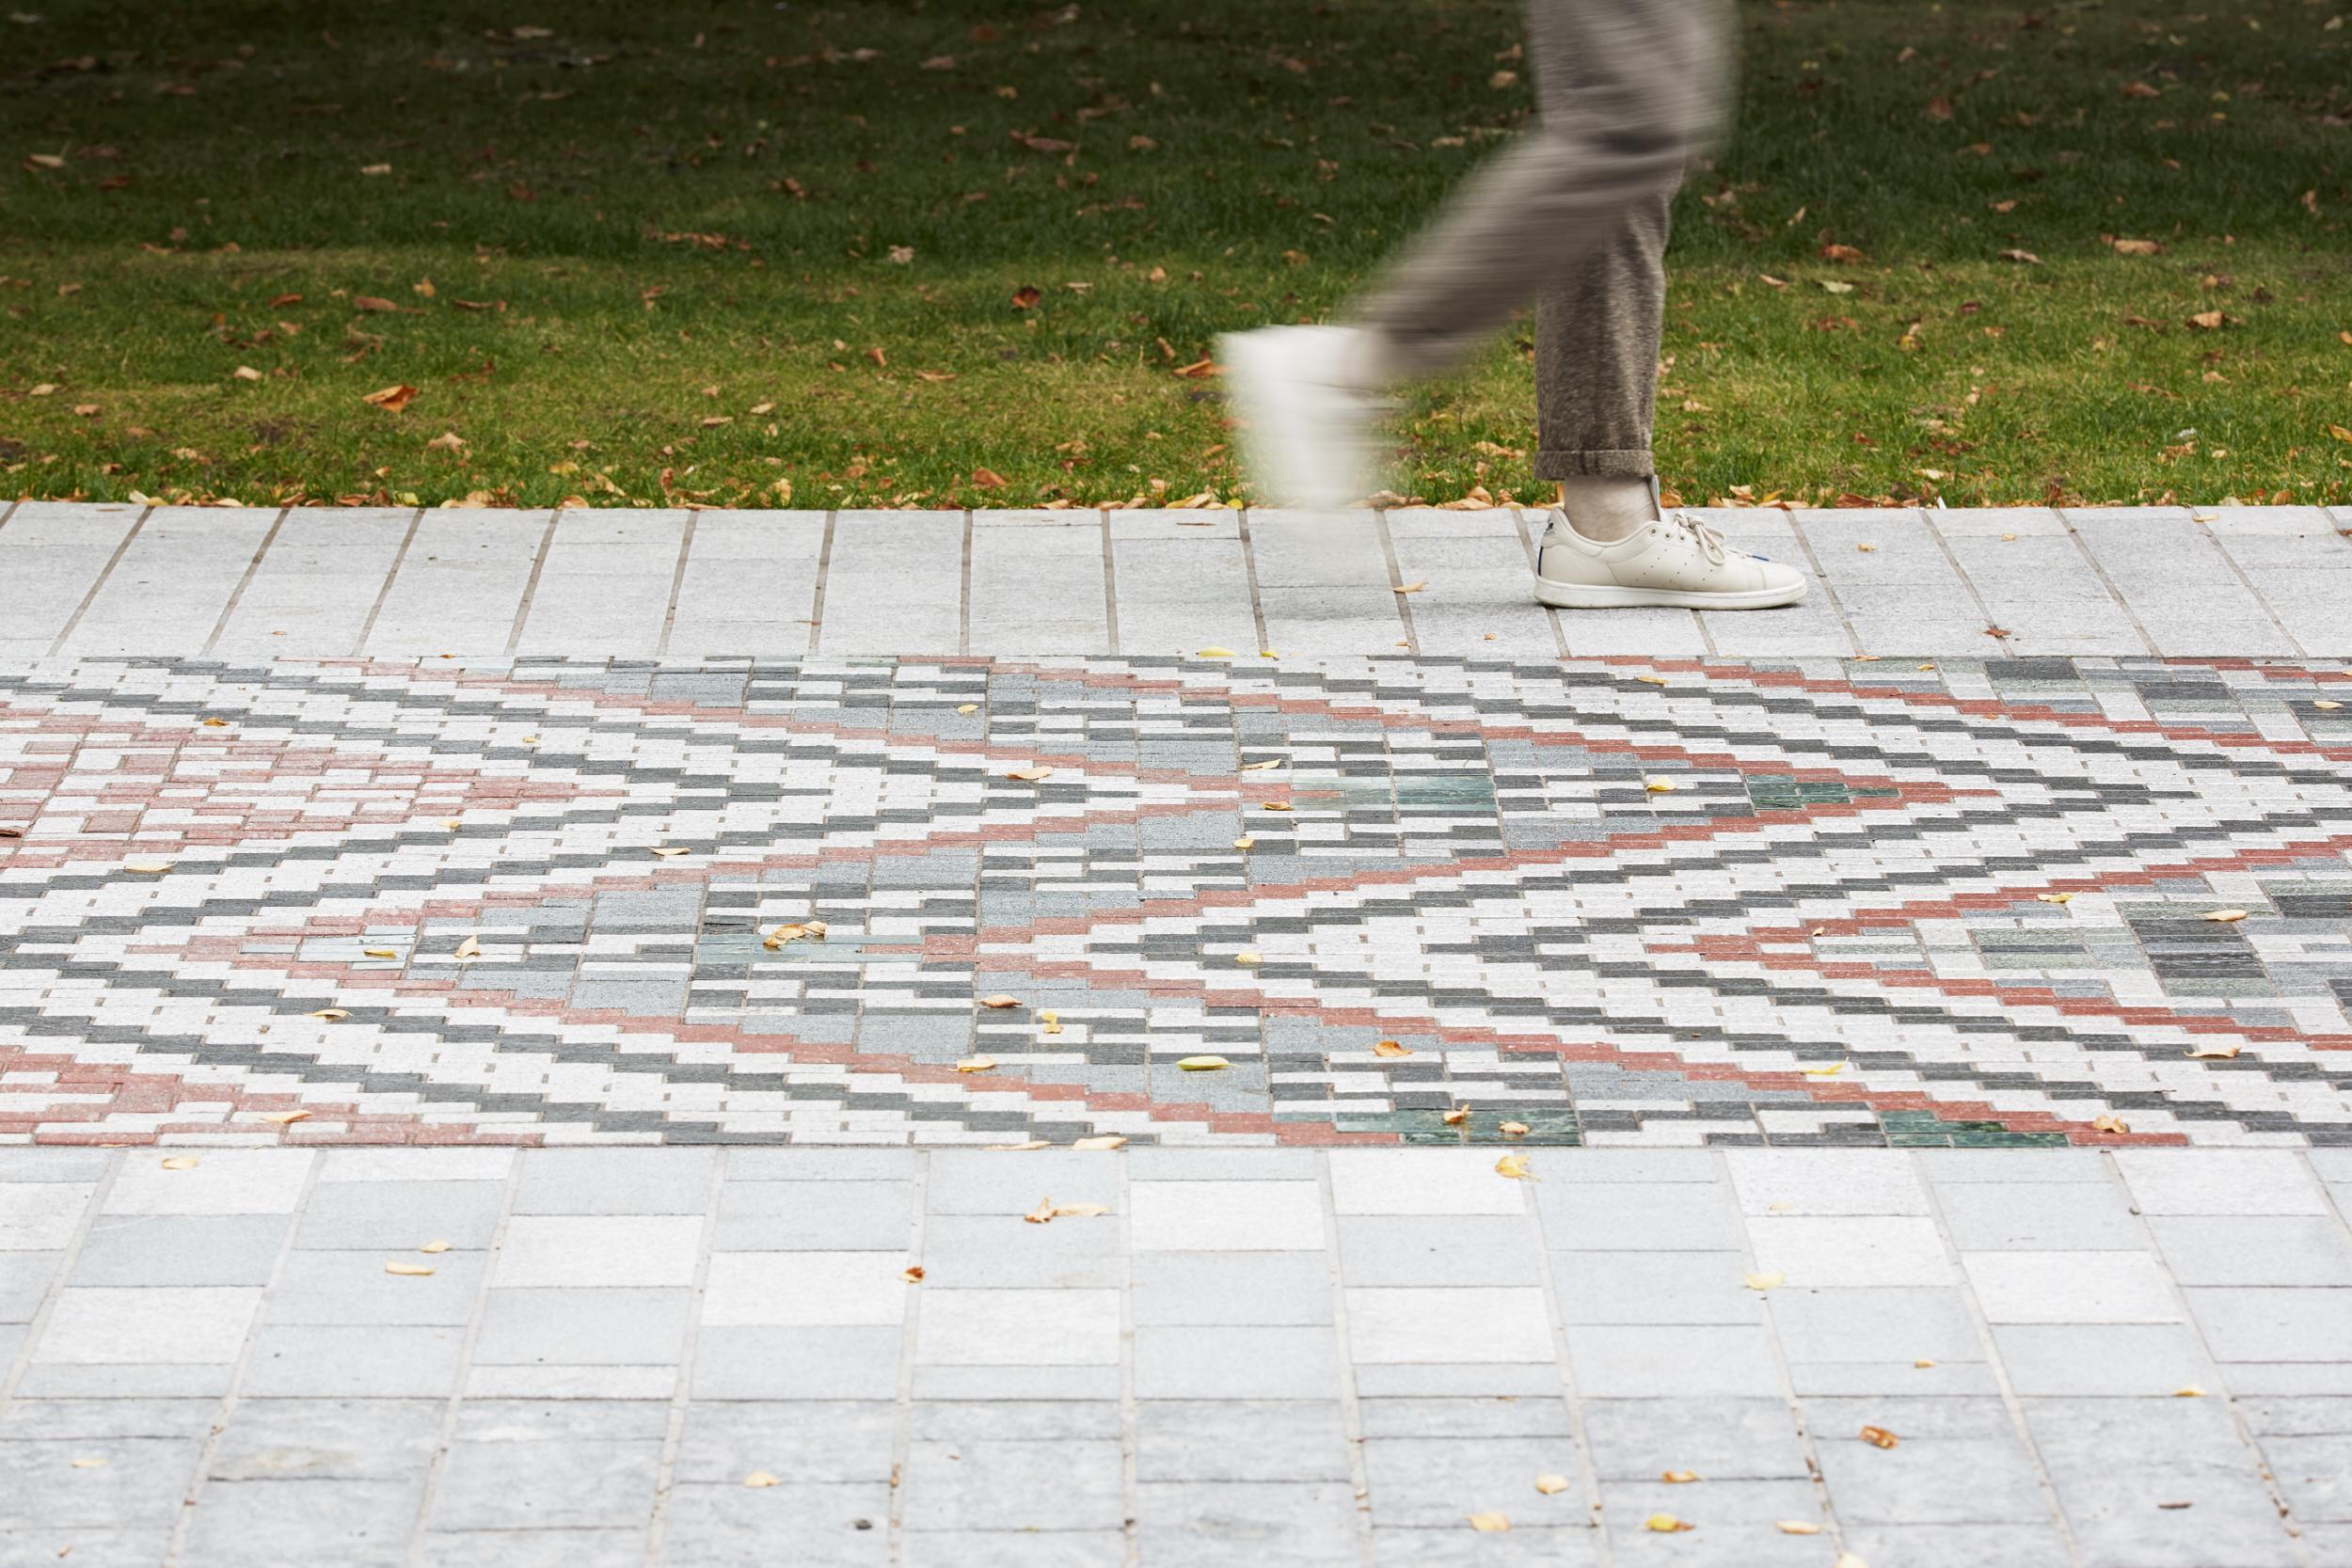 ARTS TRAIL  Avon River Artwork Interventions  Land Lab Christchurch, New Zealand